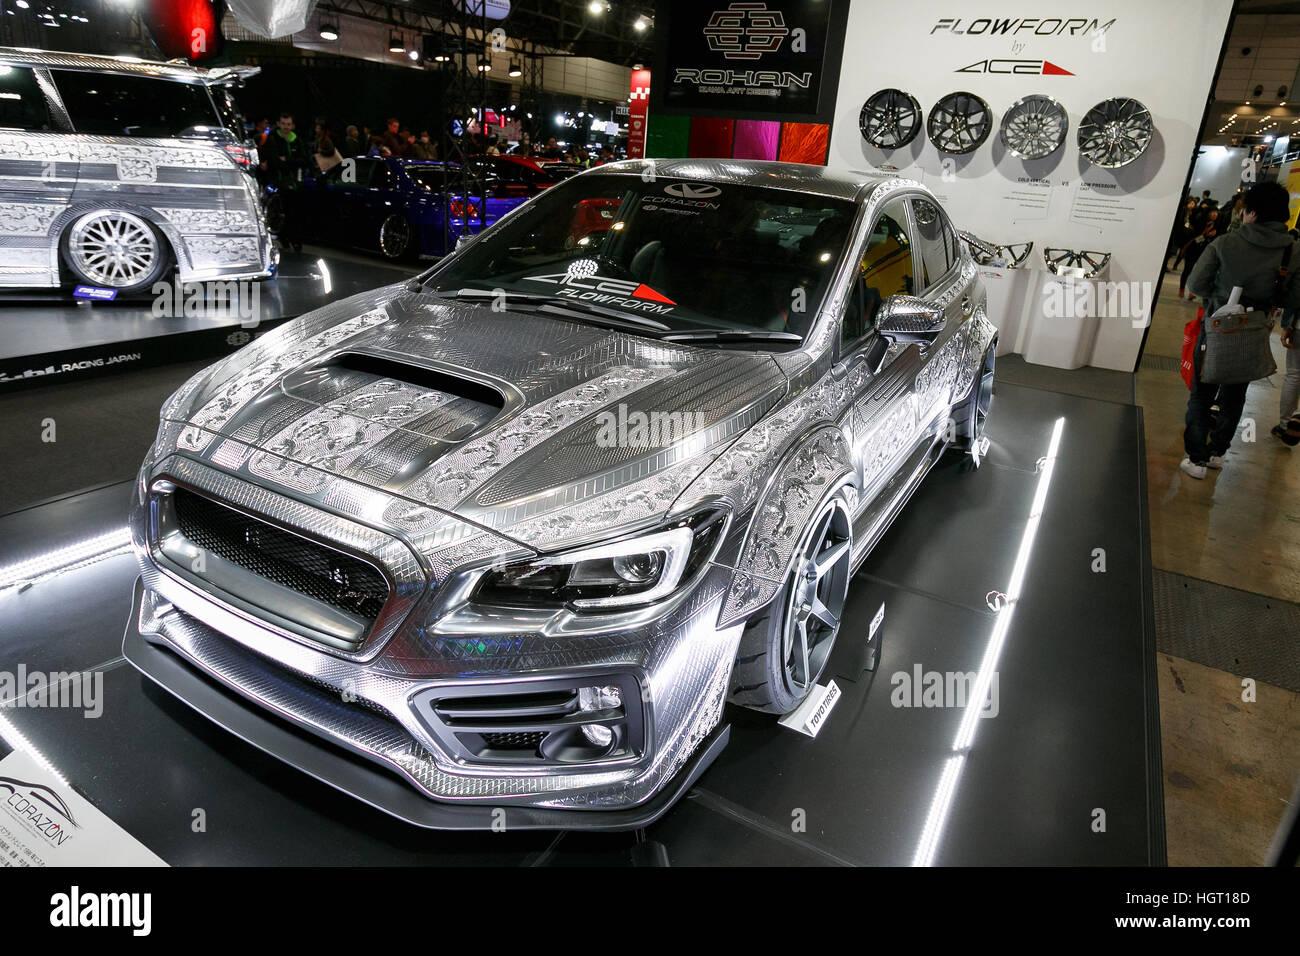 Subaru Wrx Custom >> Tokyo Japan 13th Jan 2017 A Customized Subaru Wrx Sti On